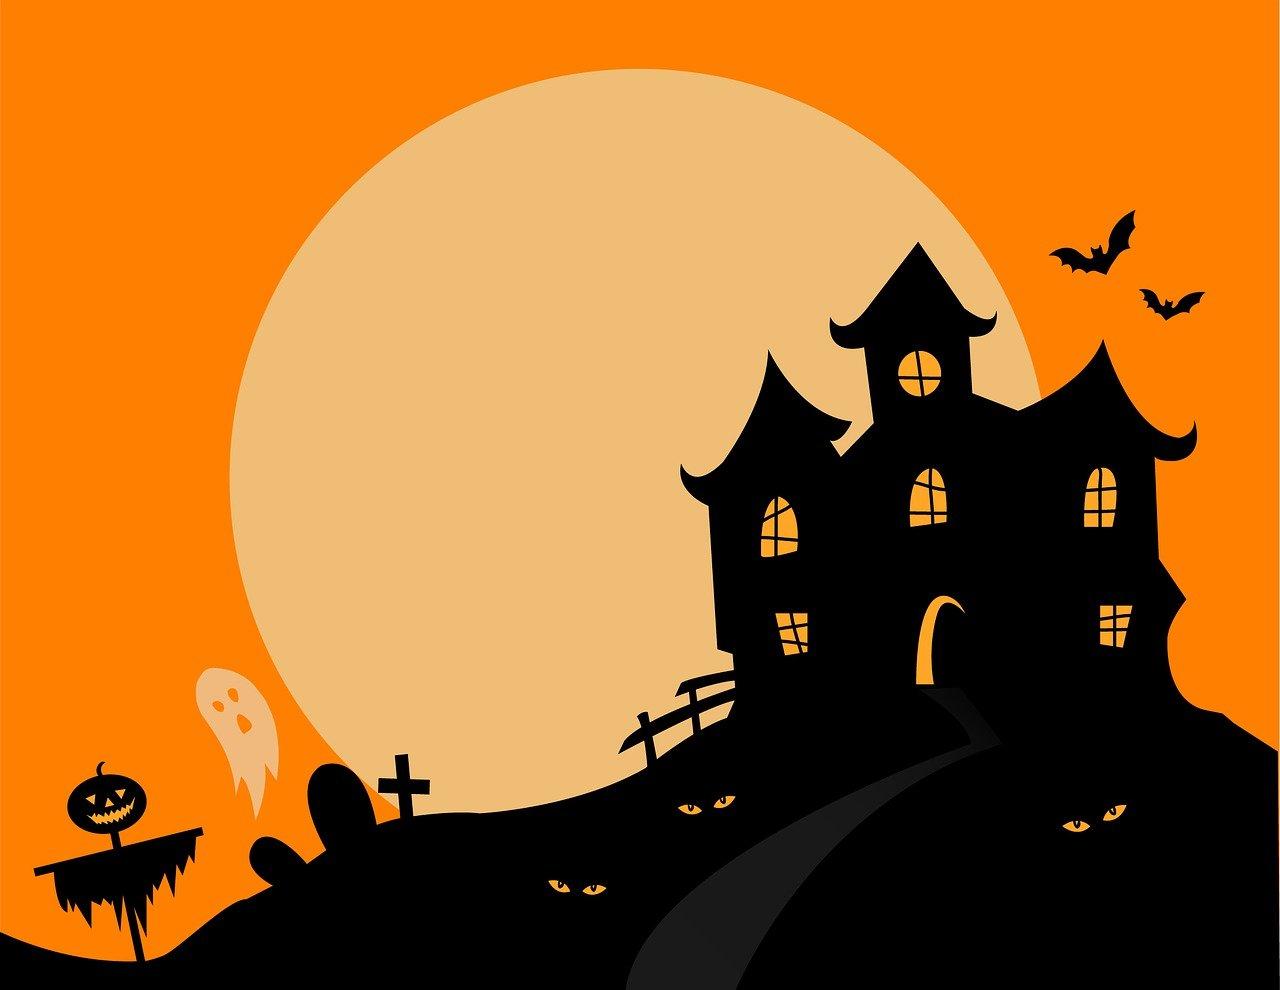 We're celebrating Halloween all weekend long